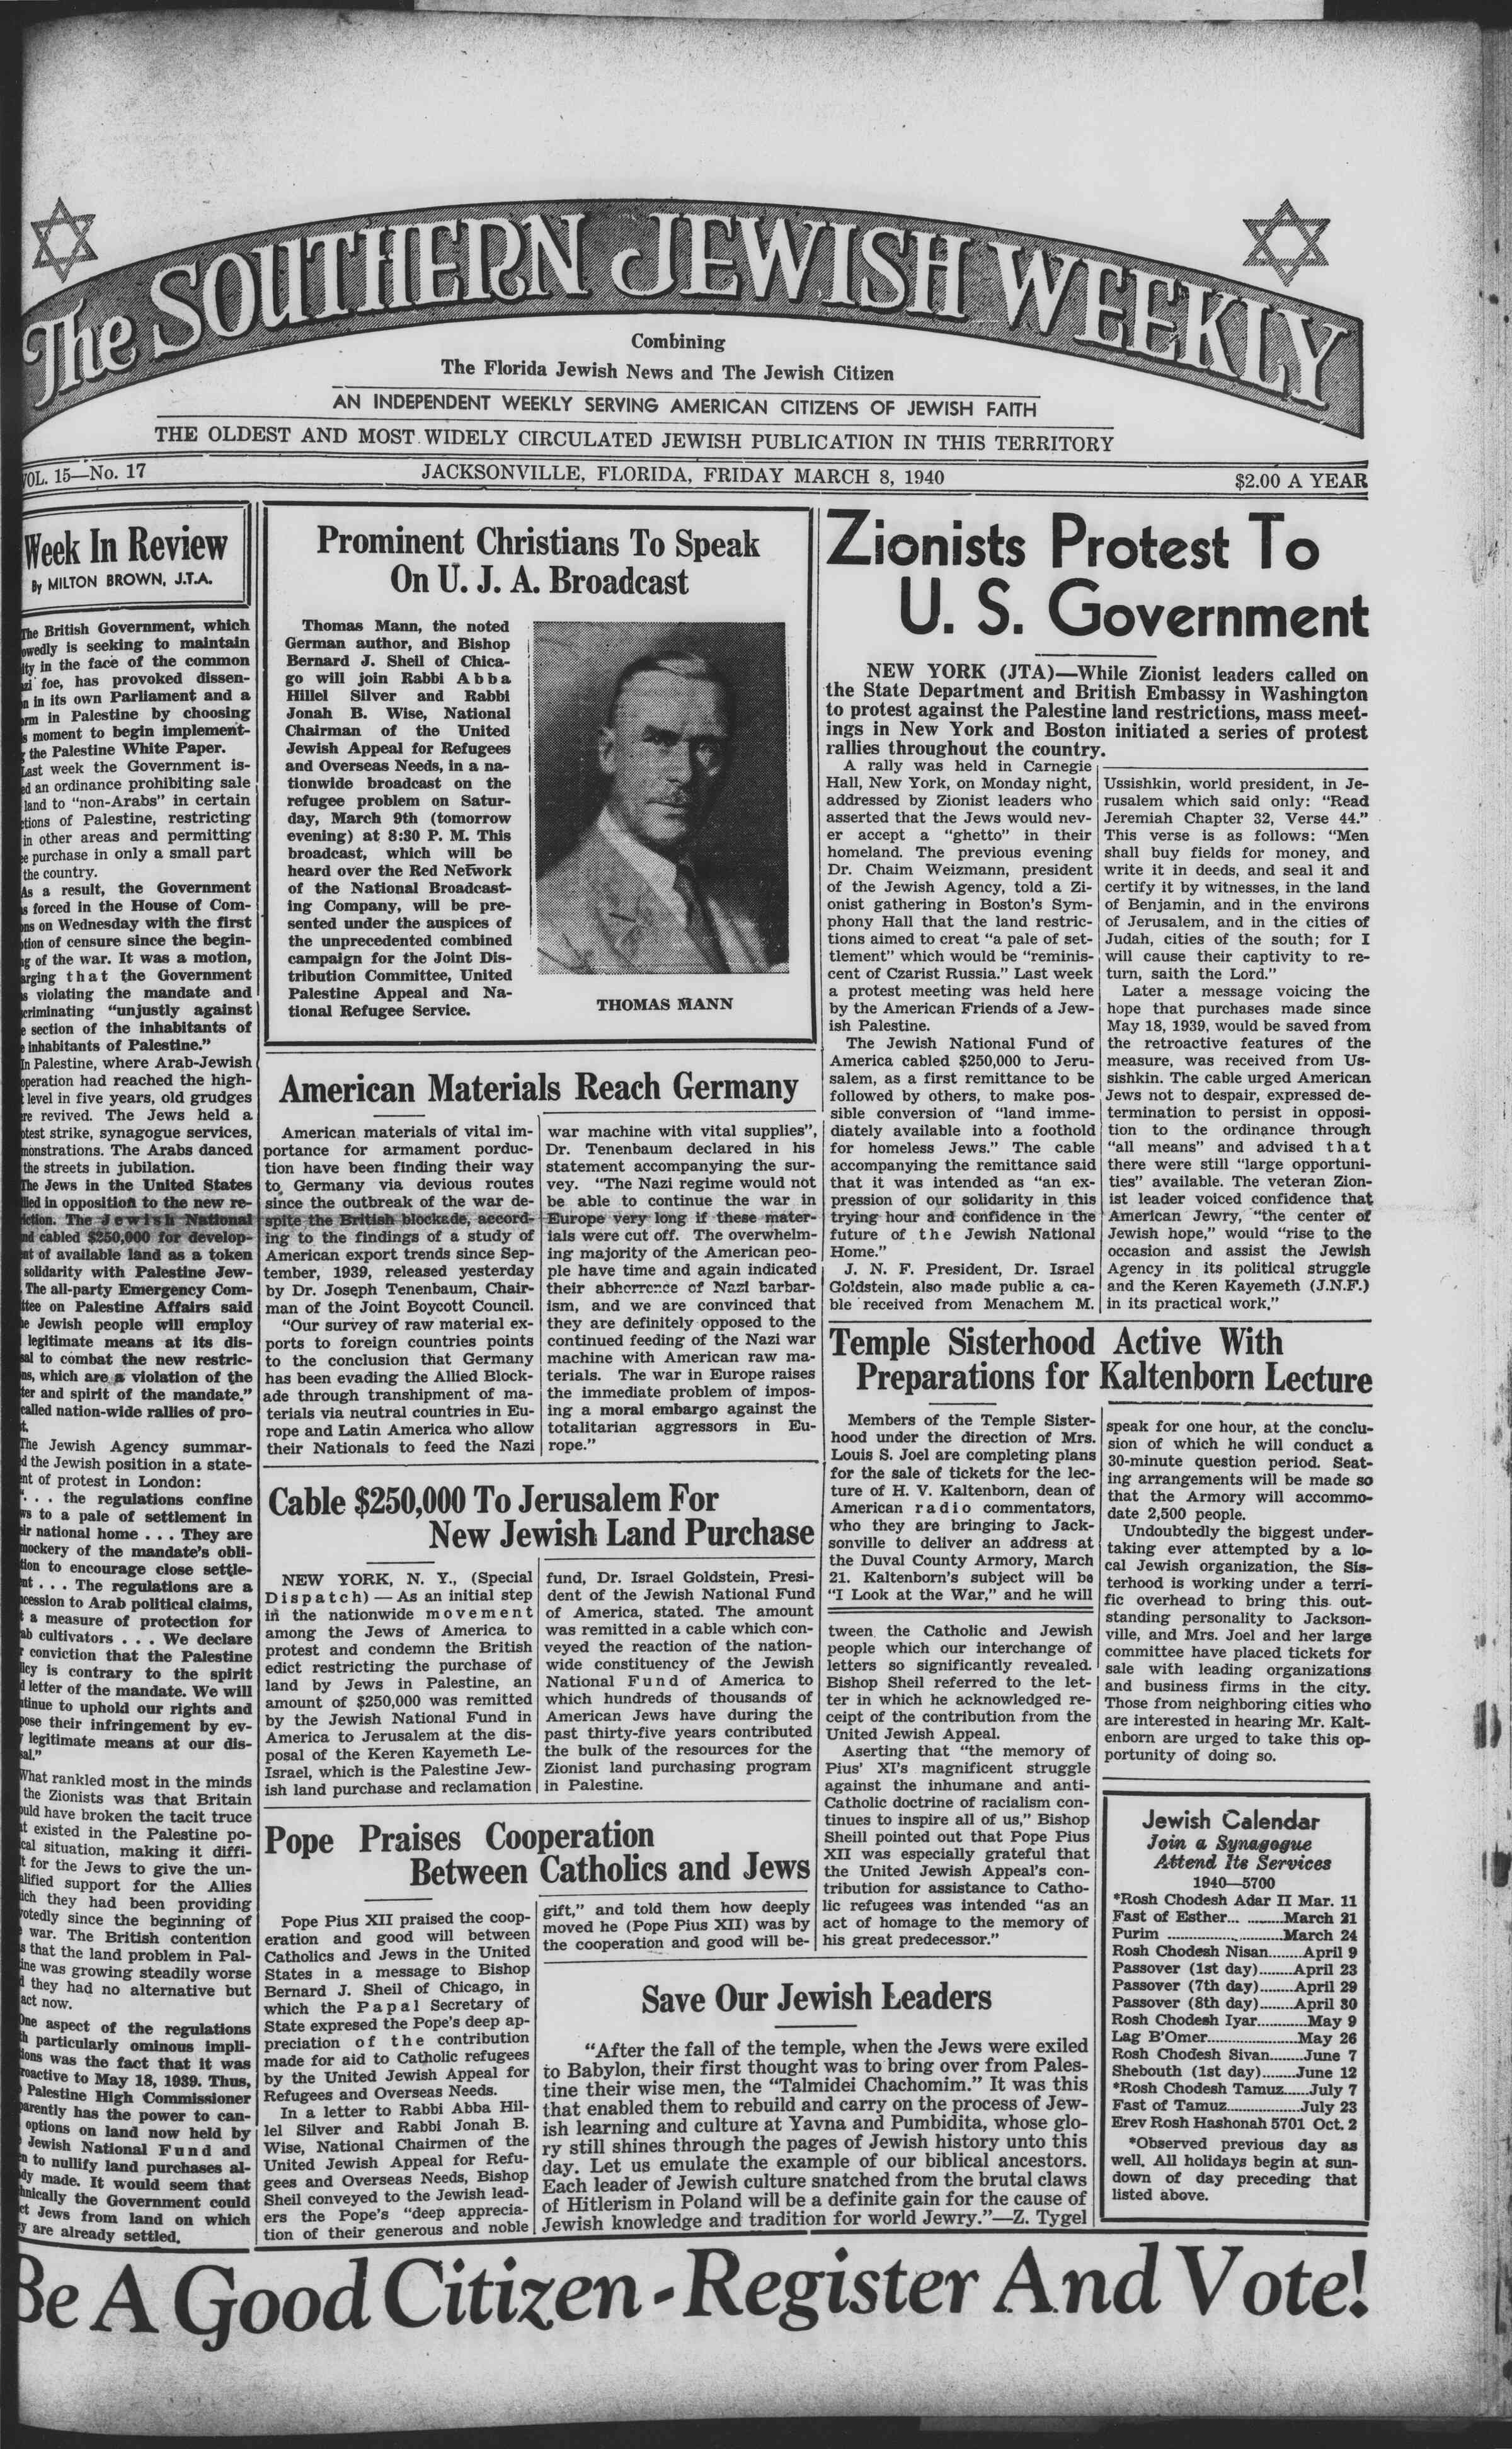 8 Mart 1940 Tarihli Southern Jewish Weekly Dergisi Sayfa 1